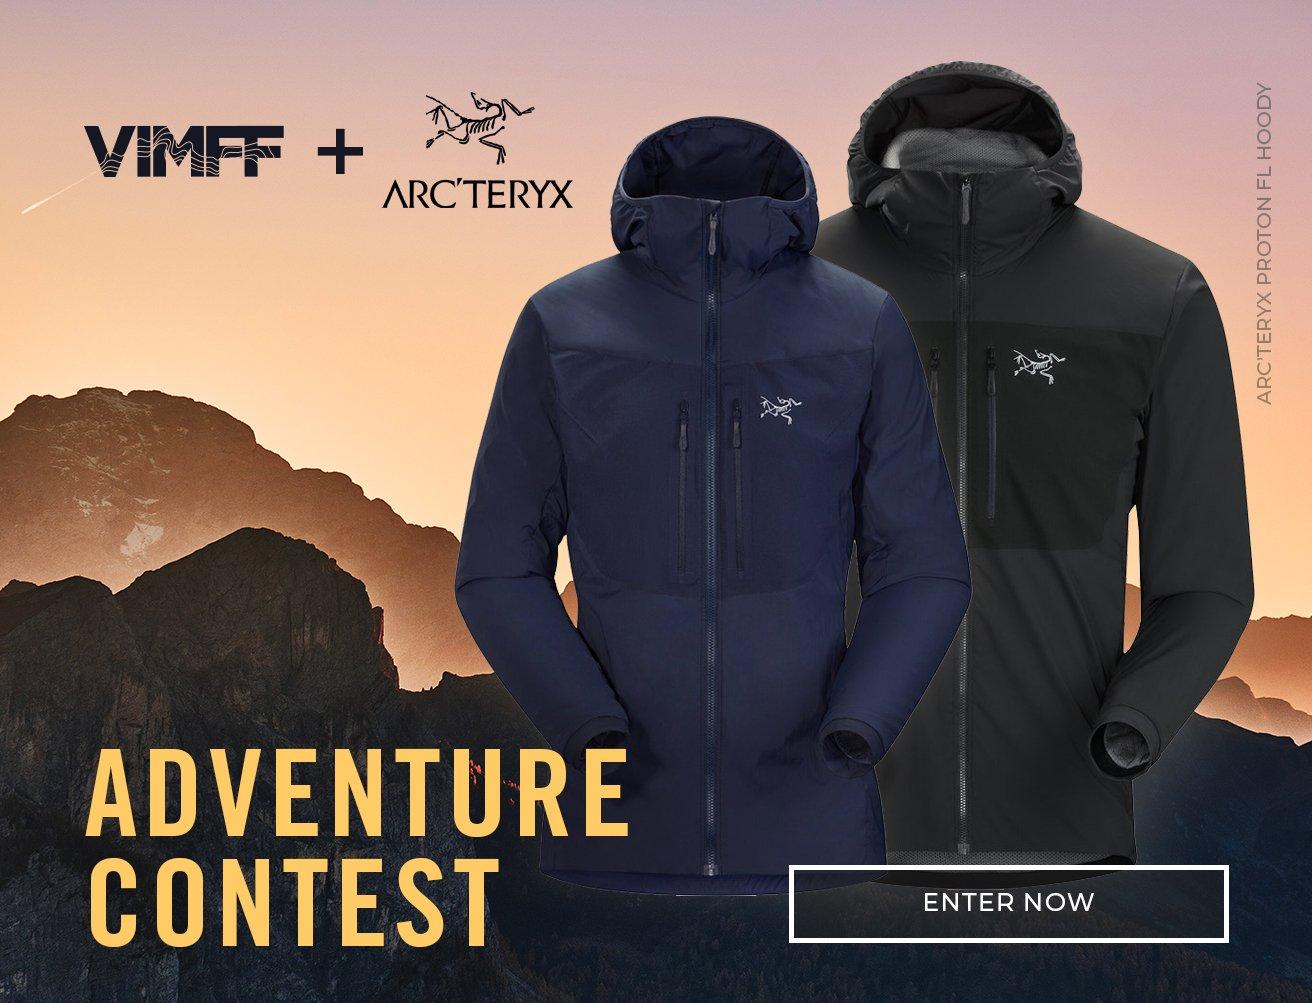 vimff arcteryx adventure contest cta